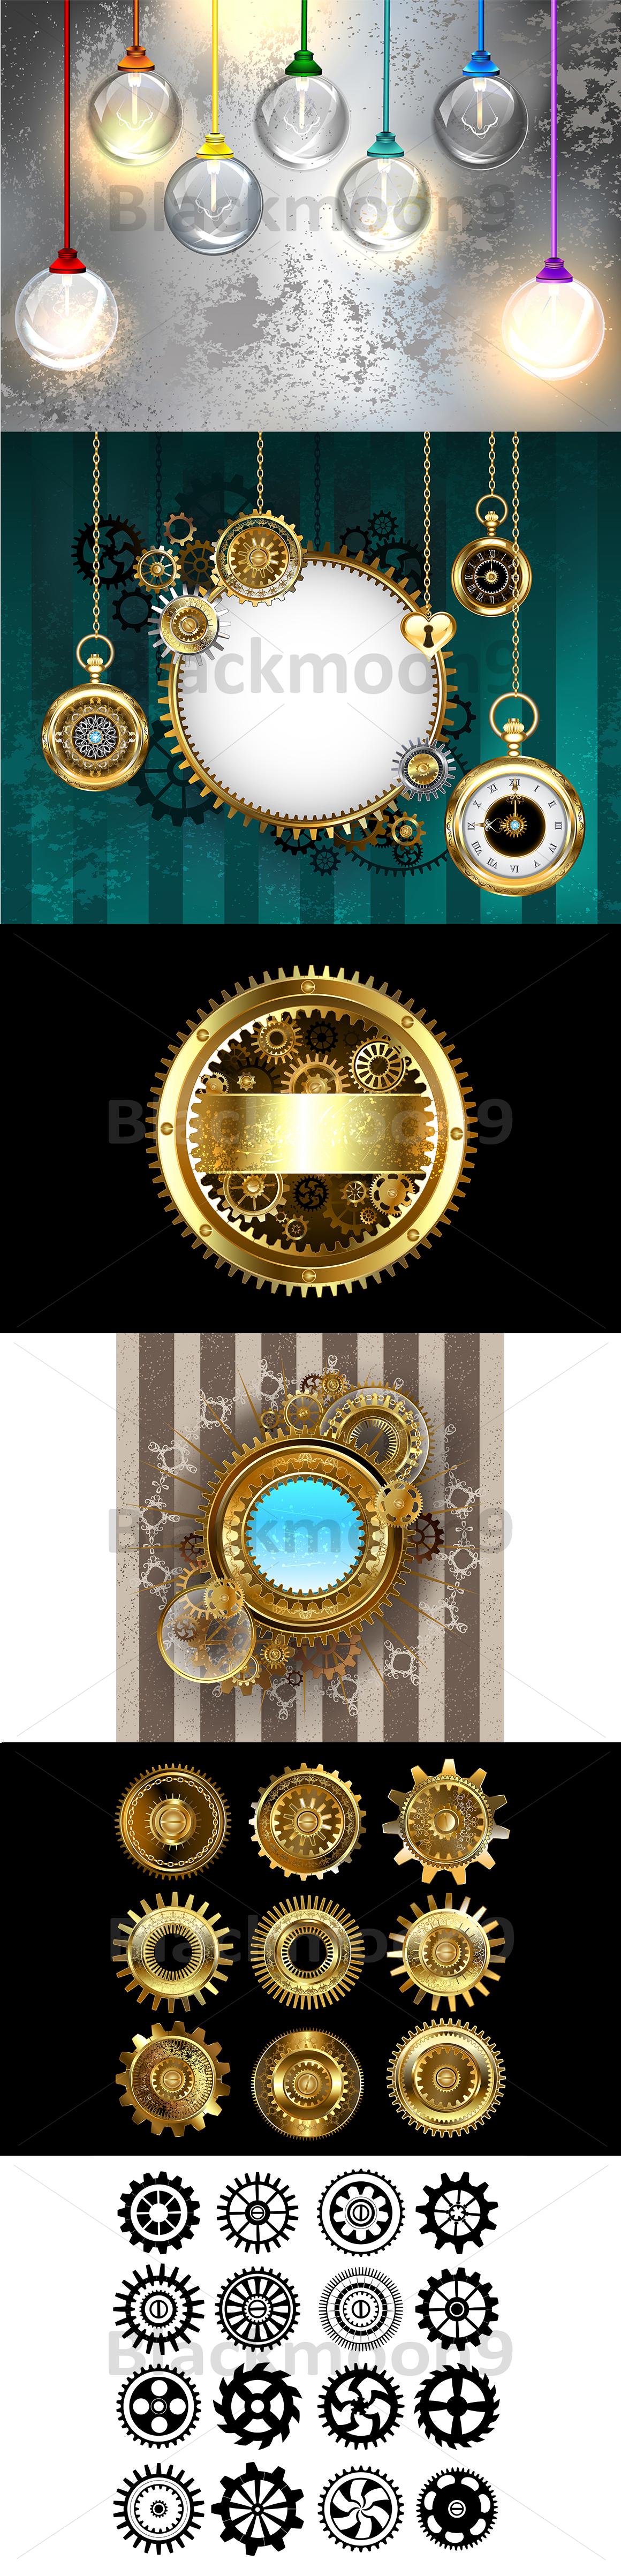 Steampunk Bundle example image 9